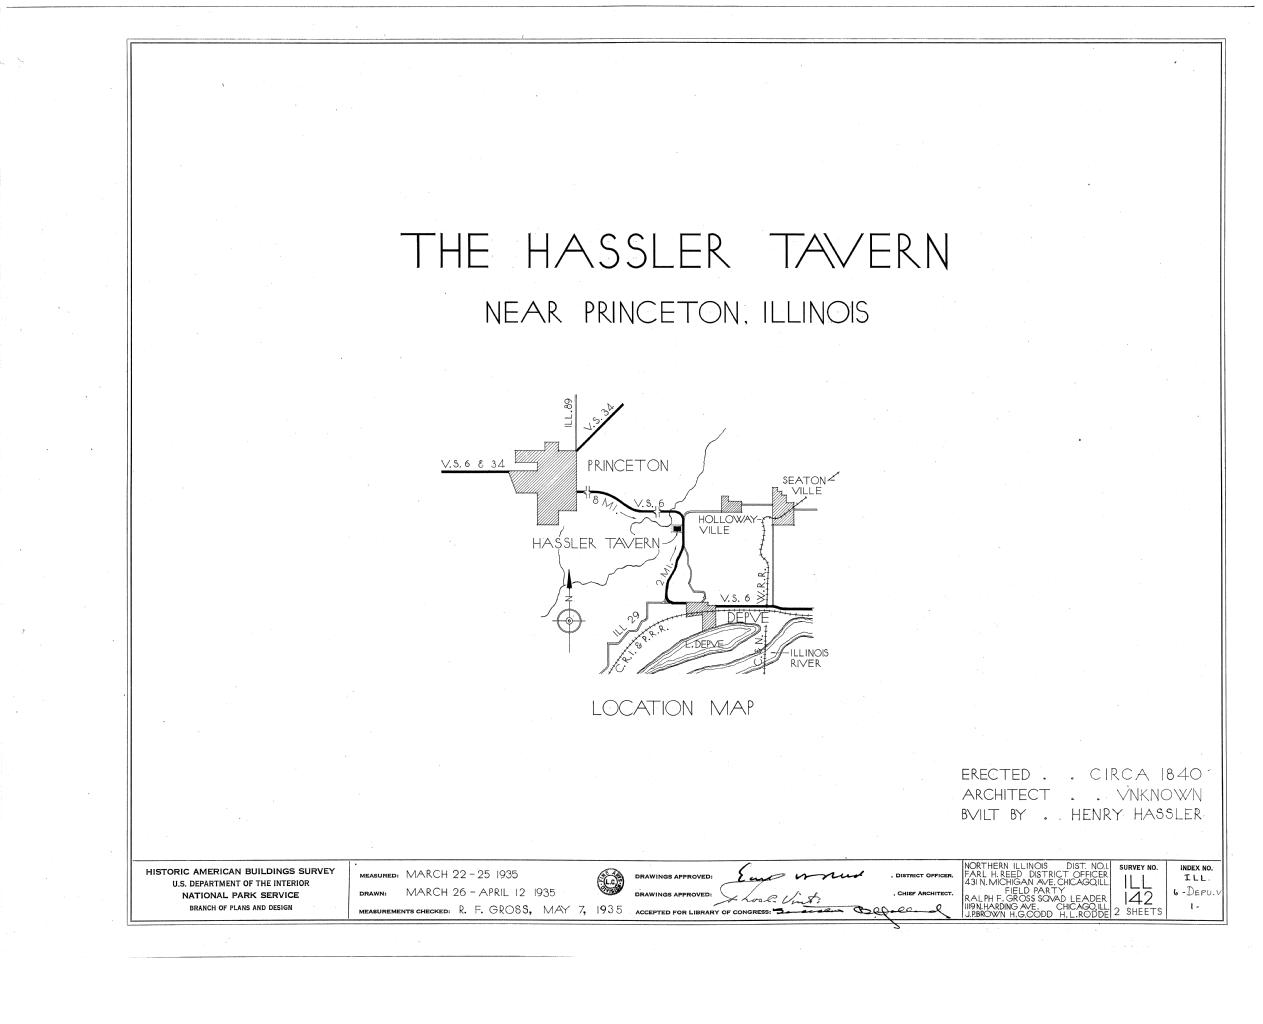 Illinois bureau county princeton - File Hassler Tavern U S Route 6 Depue Bureau County Il Habs Ill 6 Depu V 1 Sheet 0 Of 2 Png